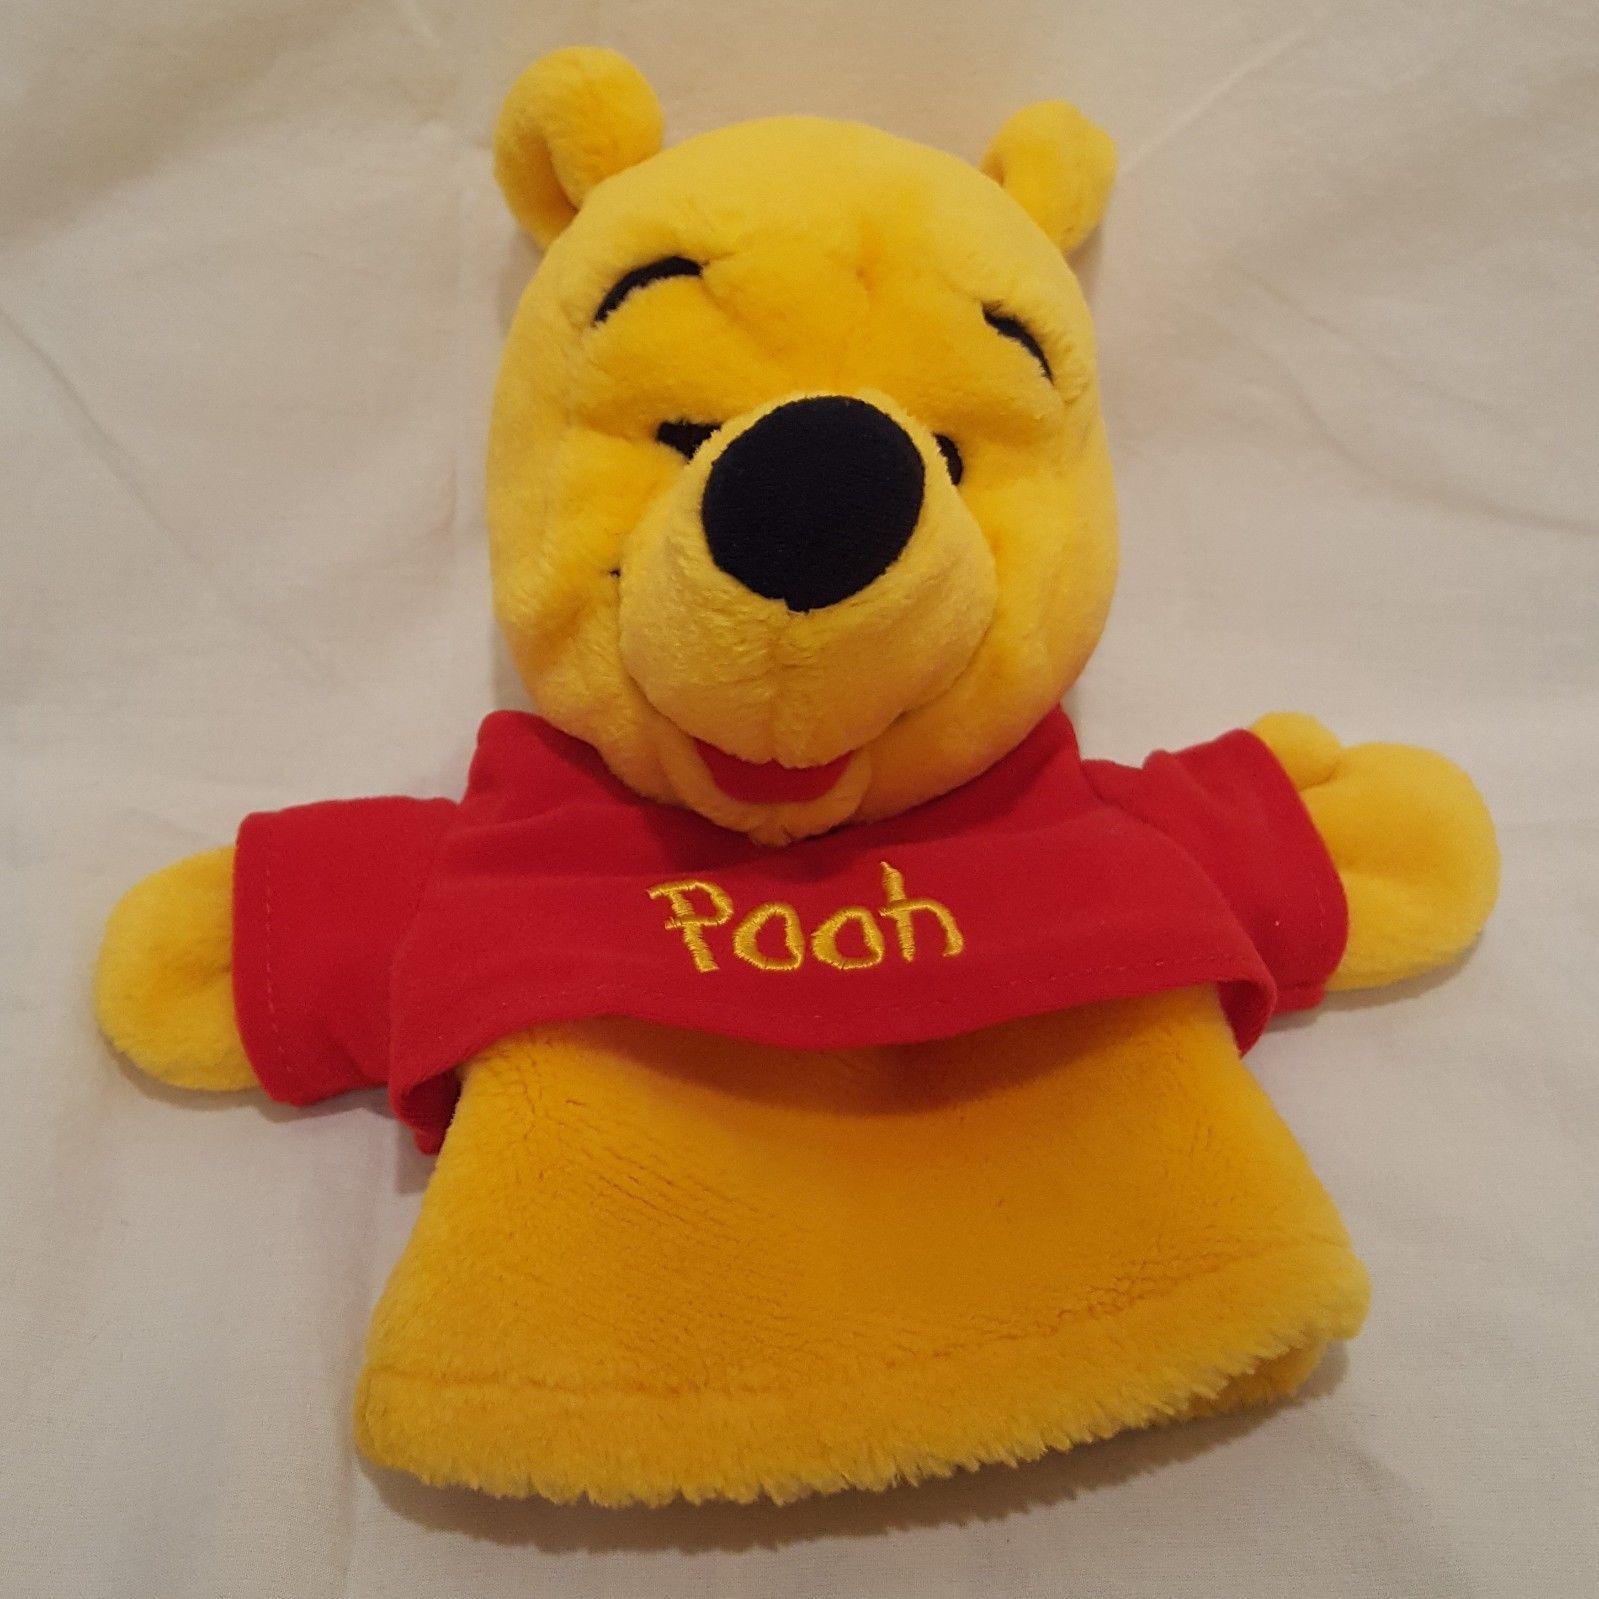 "Winnie the Pooh Hand Puppet Disney 9""  Plush Stuffed Animal Toy"